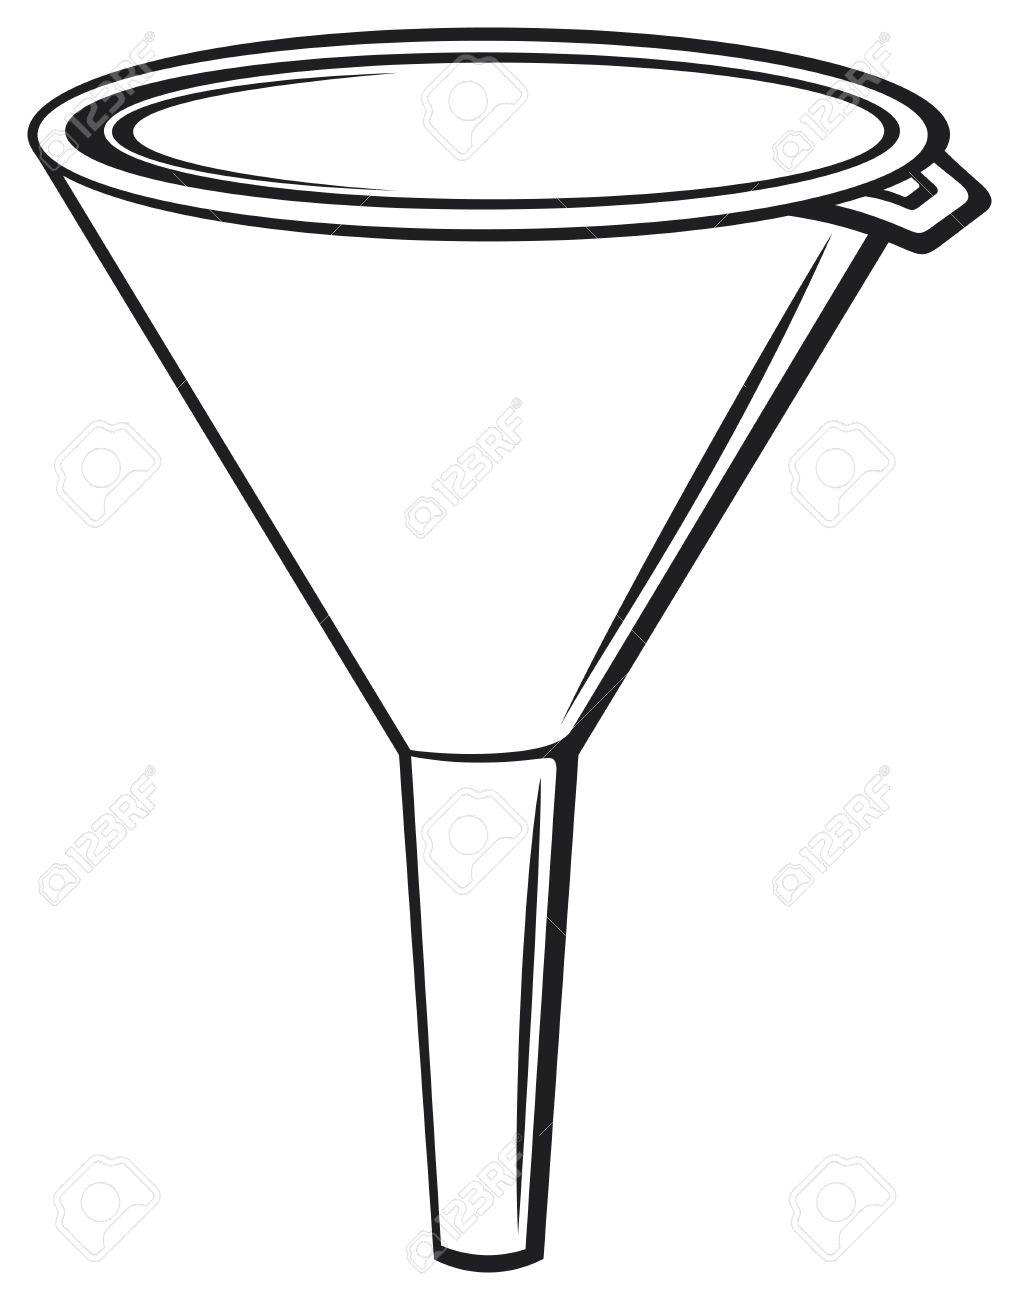 illustration of funnel plastic funnel for domestic use, plastic...